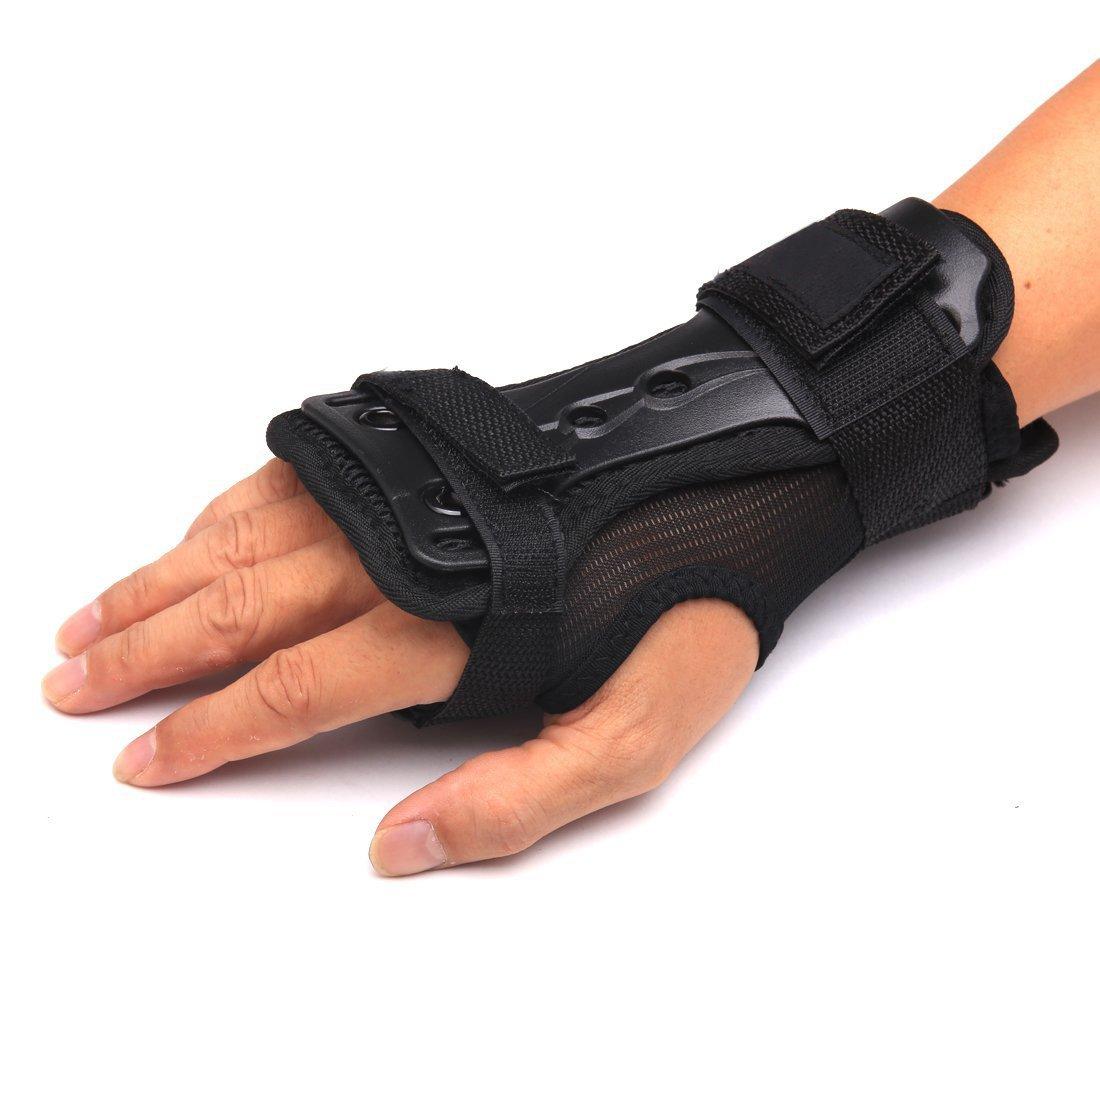 Andux Ski Gloves Extended Wrist Palms Protection Roller Skating Hard Gauntlets Adjustable Skateboard Gauntlets Support HXHW-01 (L) by Andux